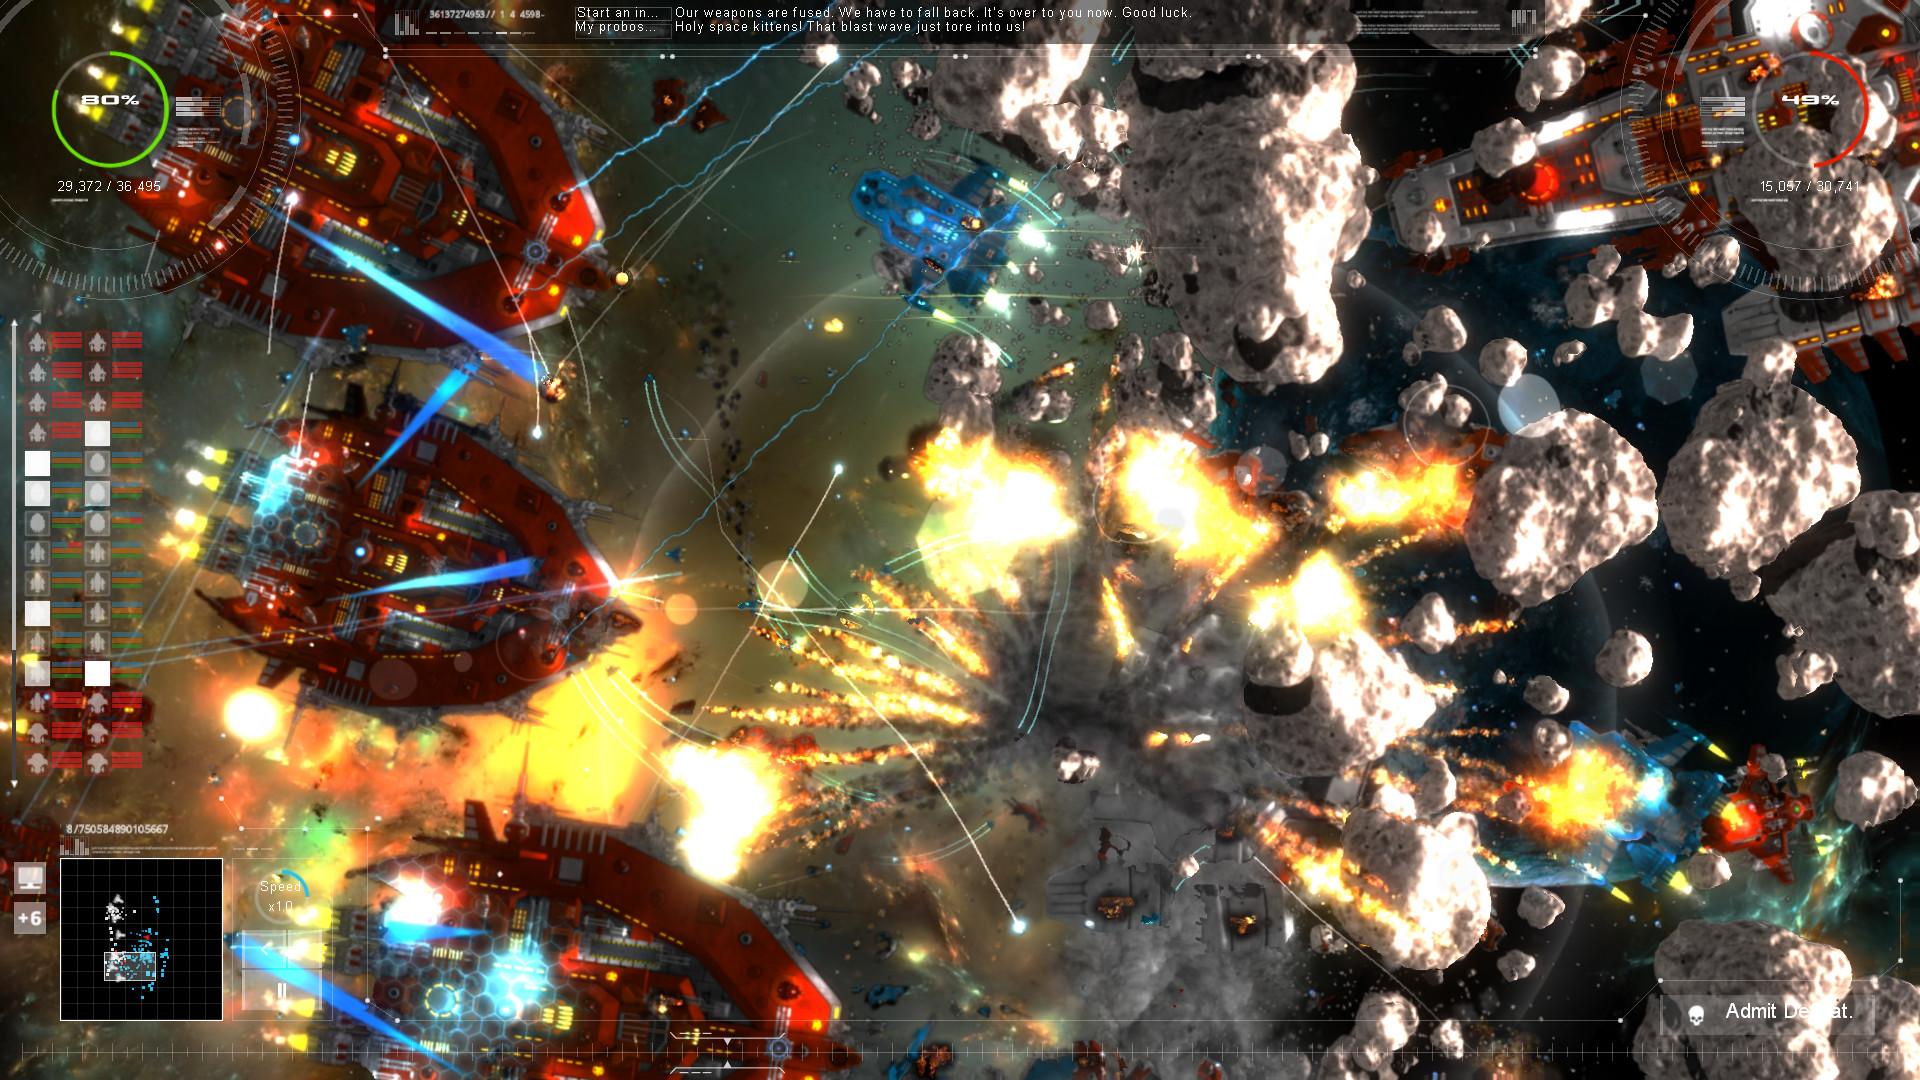 Gratuitous Space Battles 2 screenshot